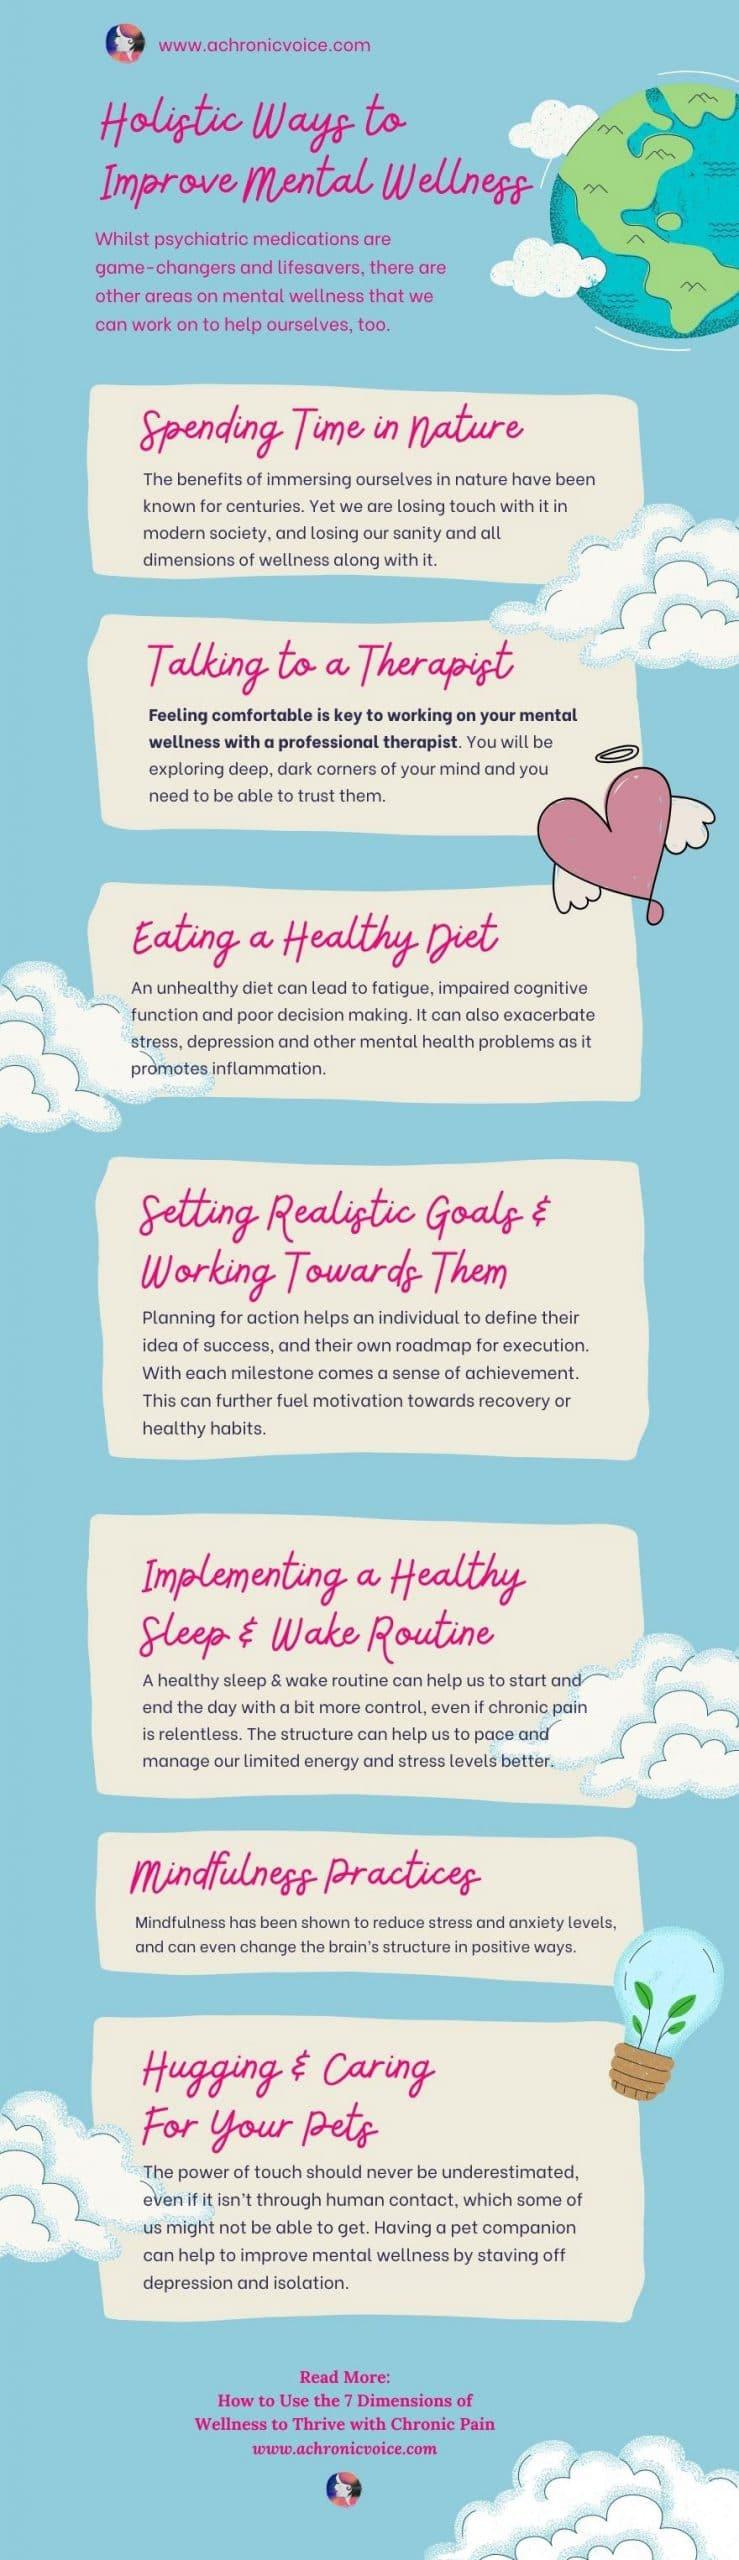 Holistic Ways to Improve Mental Wellness Infographic